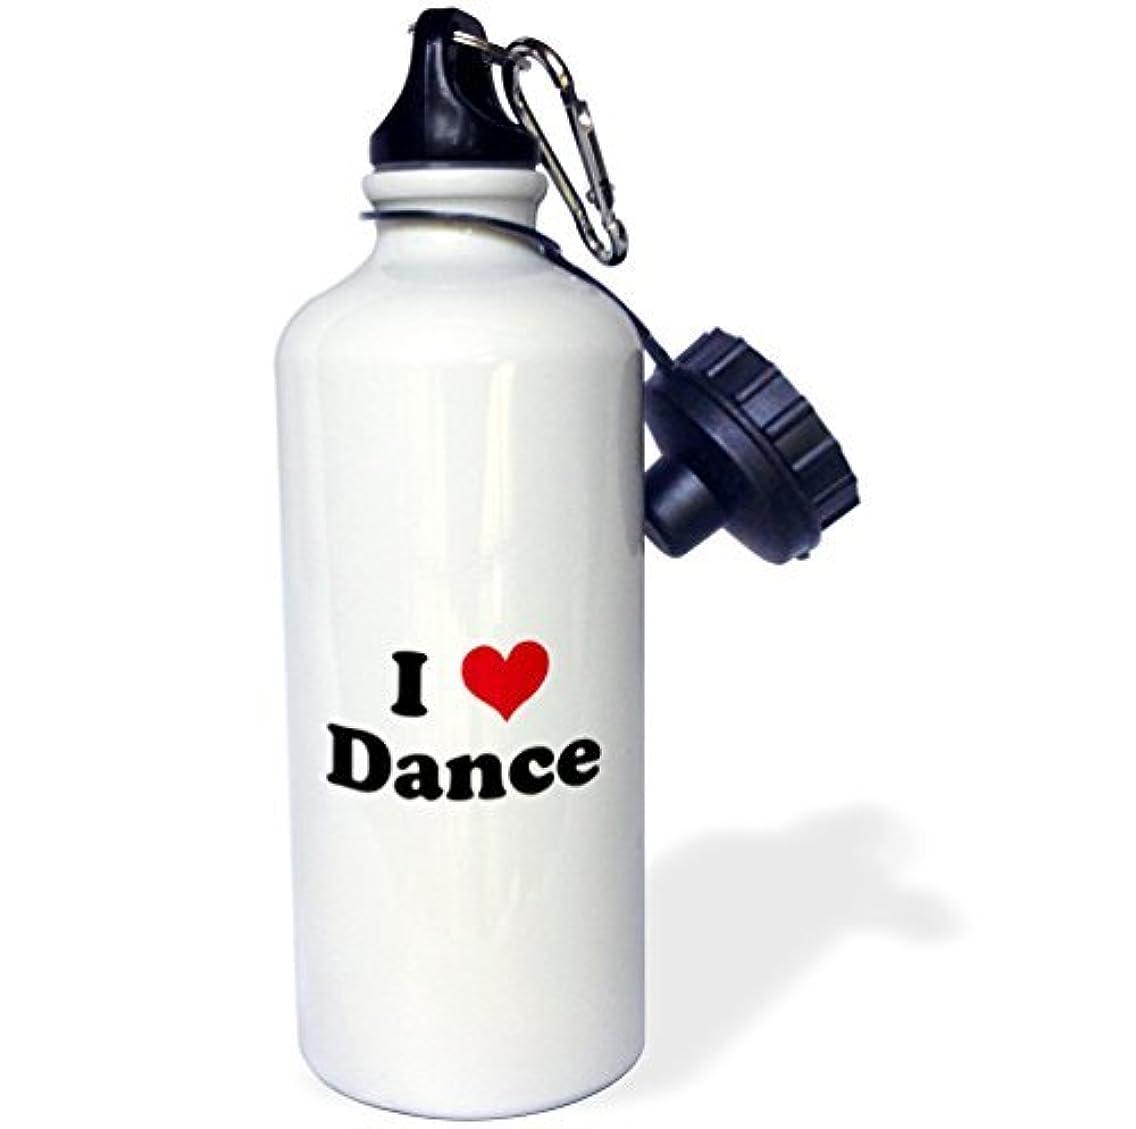 Moson Sports Water Bottle Gift for Kids Girl Boy, I Love Dance Stainless Steel Water Bottle for School Office Travel 21oz